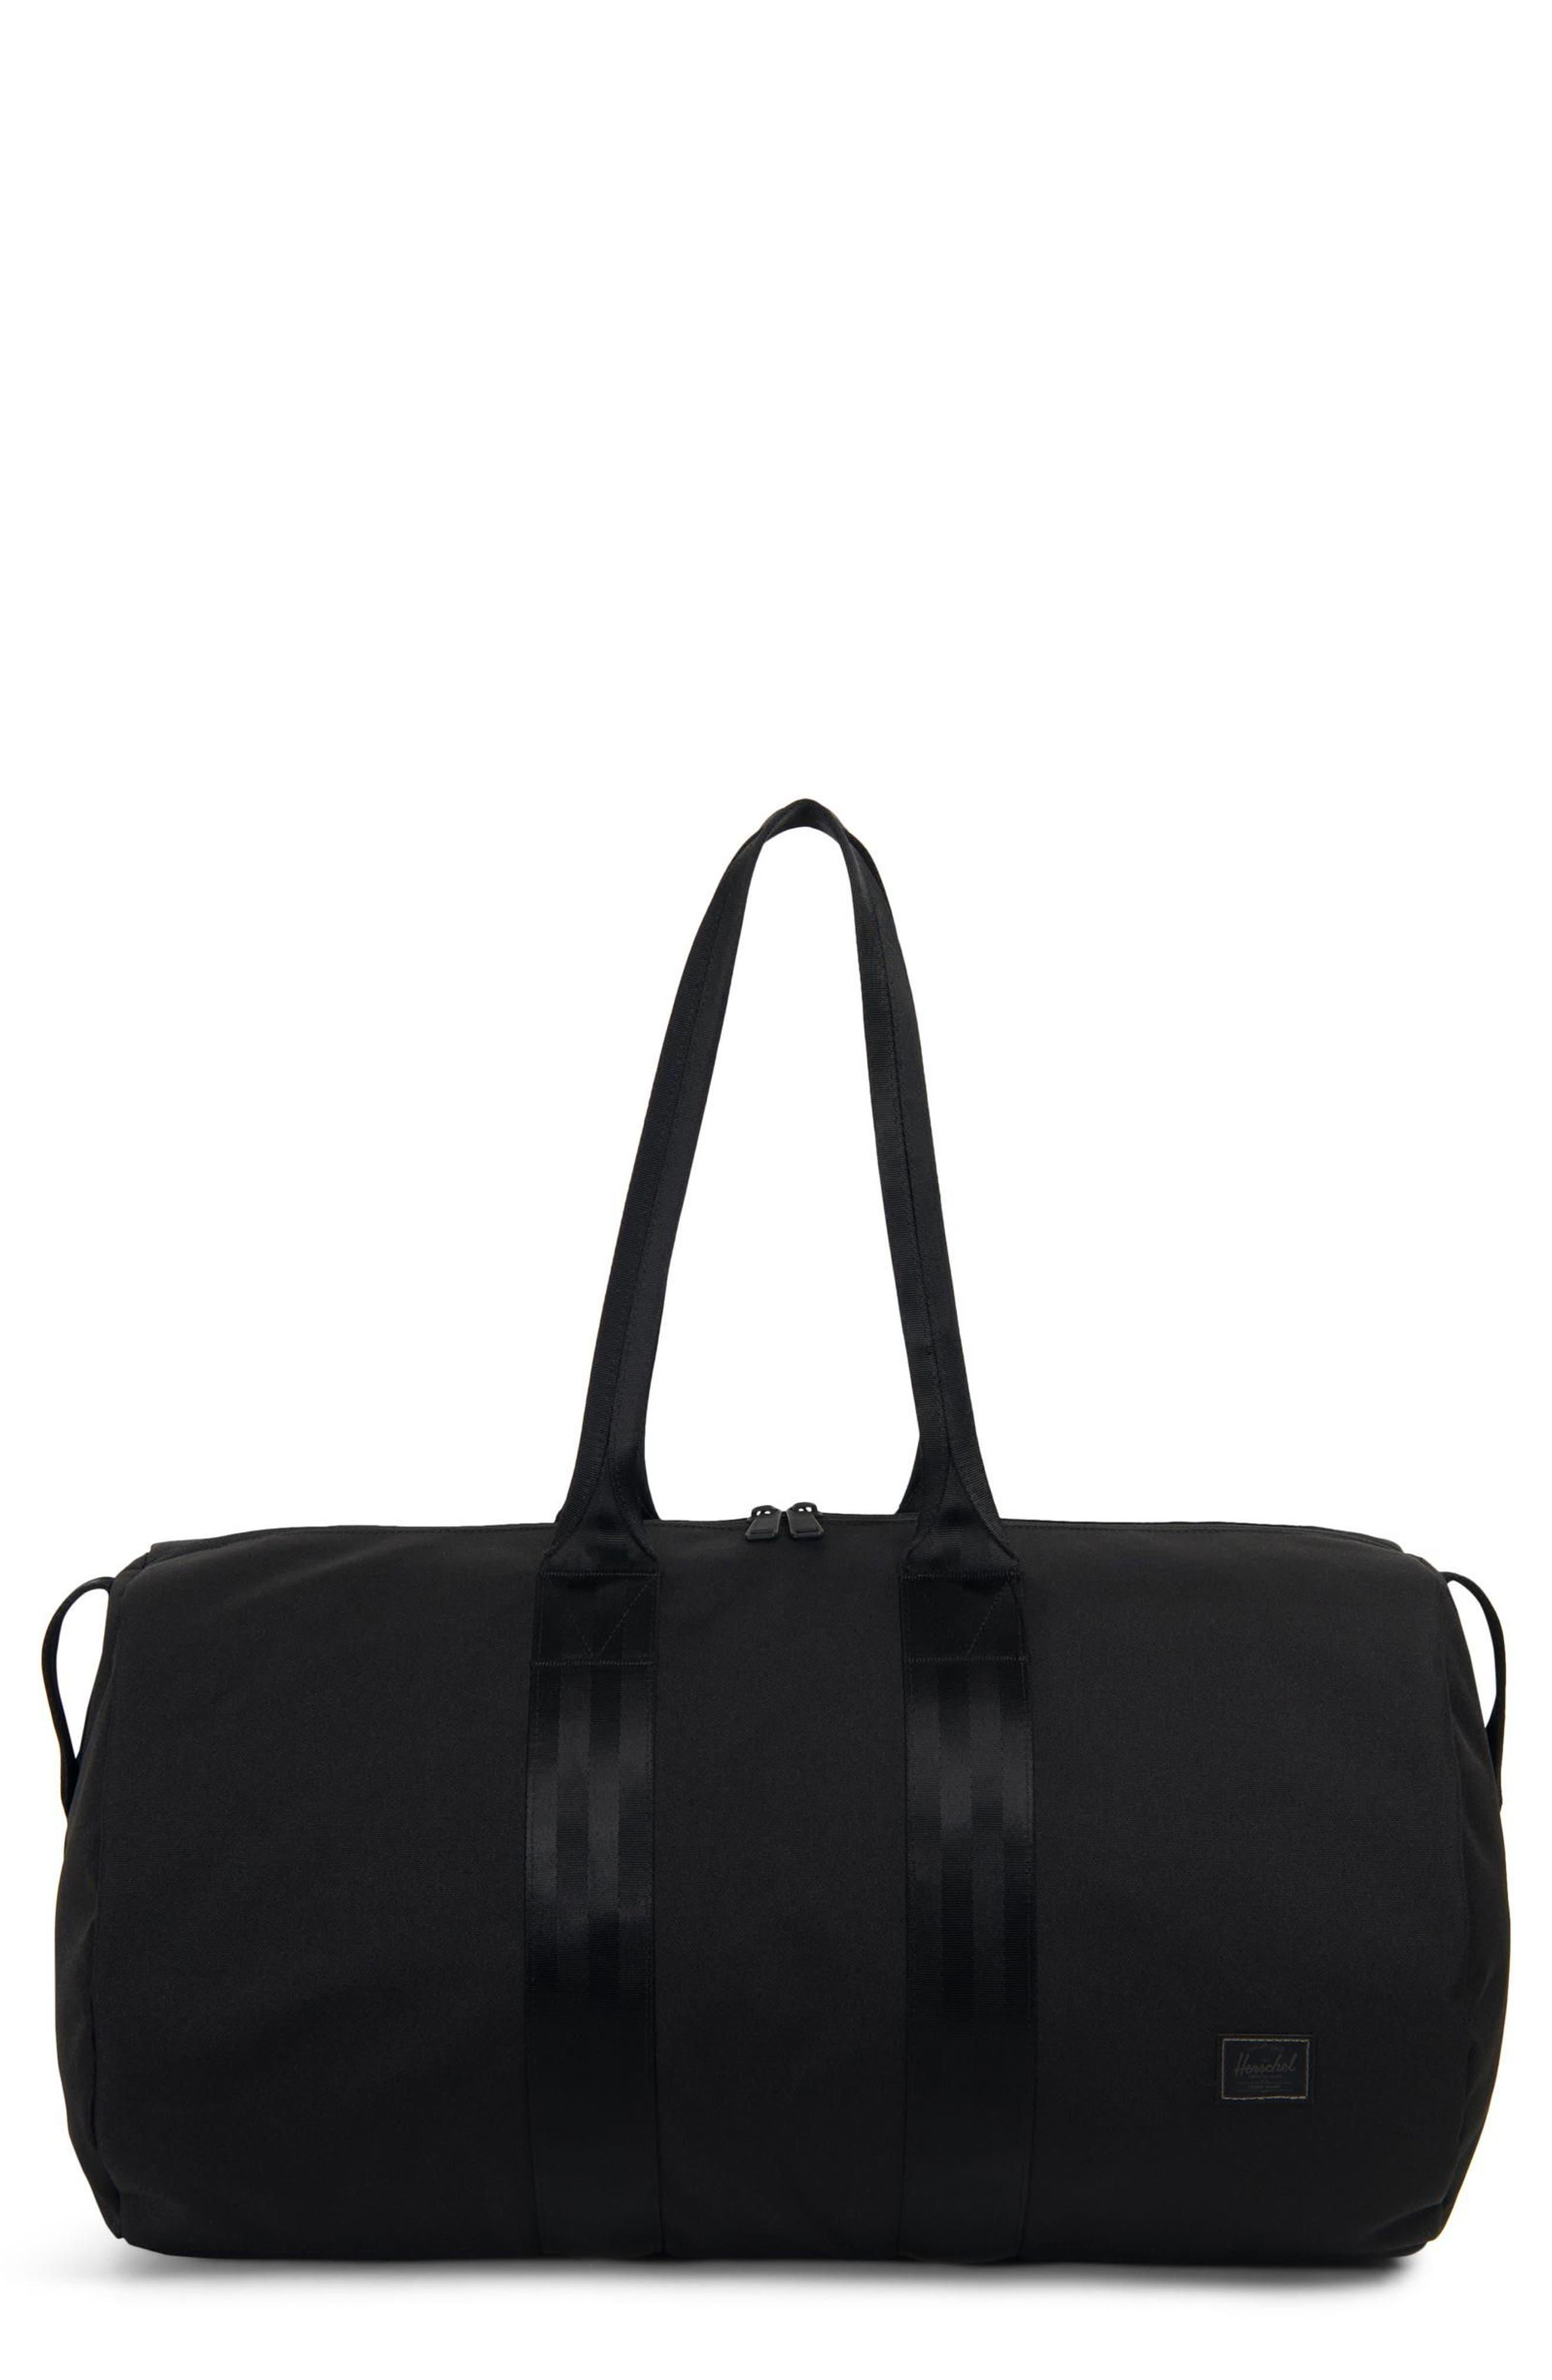 Hayward Duffel Bag,                             Main thumbnail 1, color,                             BLACK